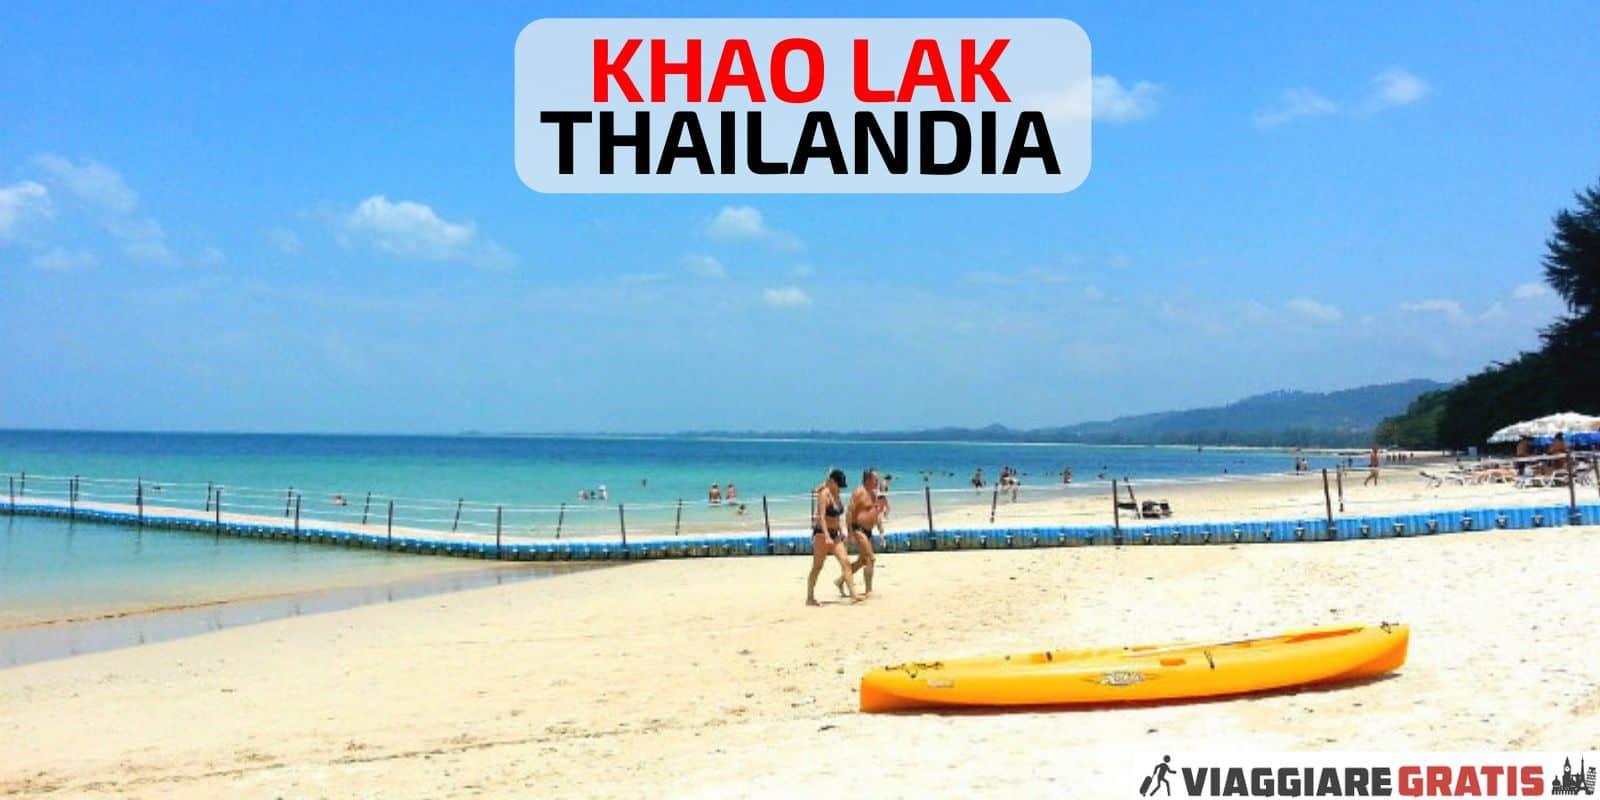 Thailandia Khao Lak